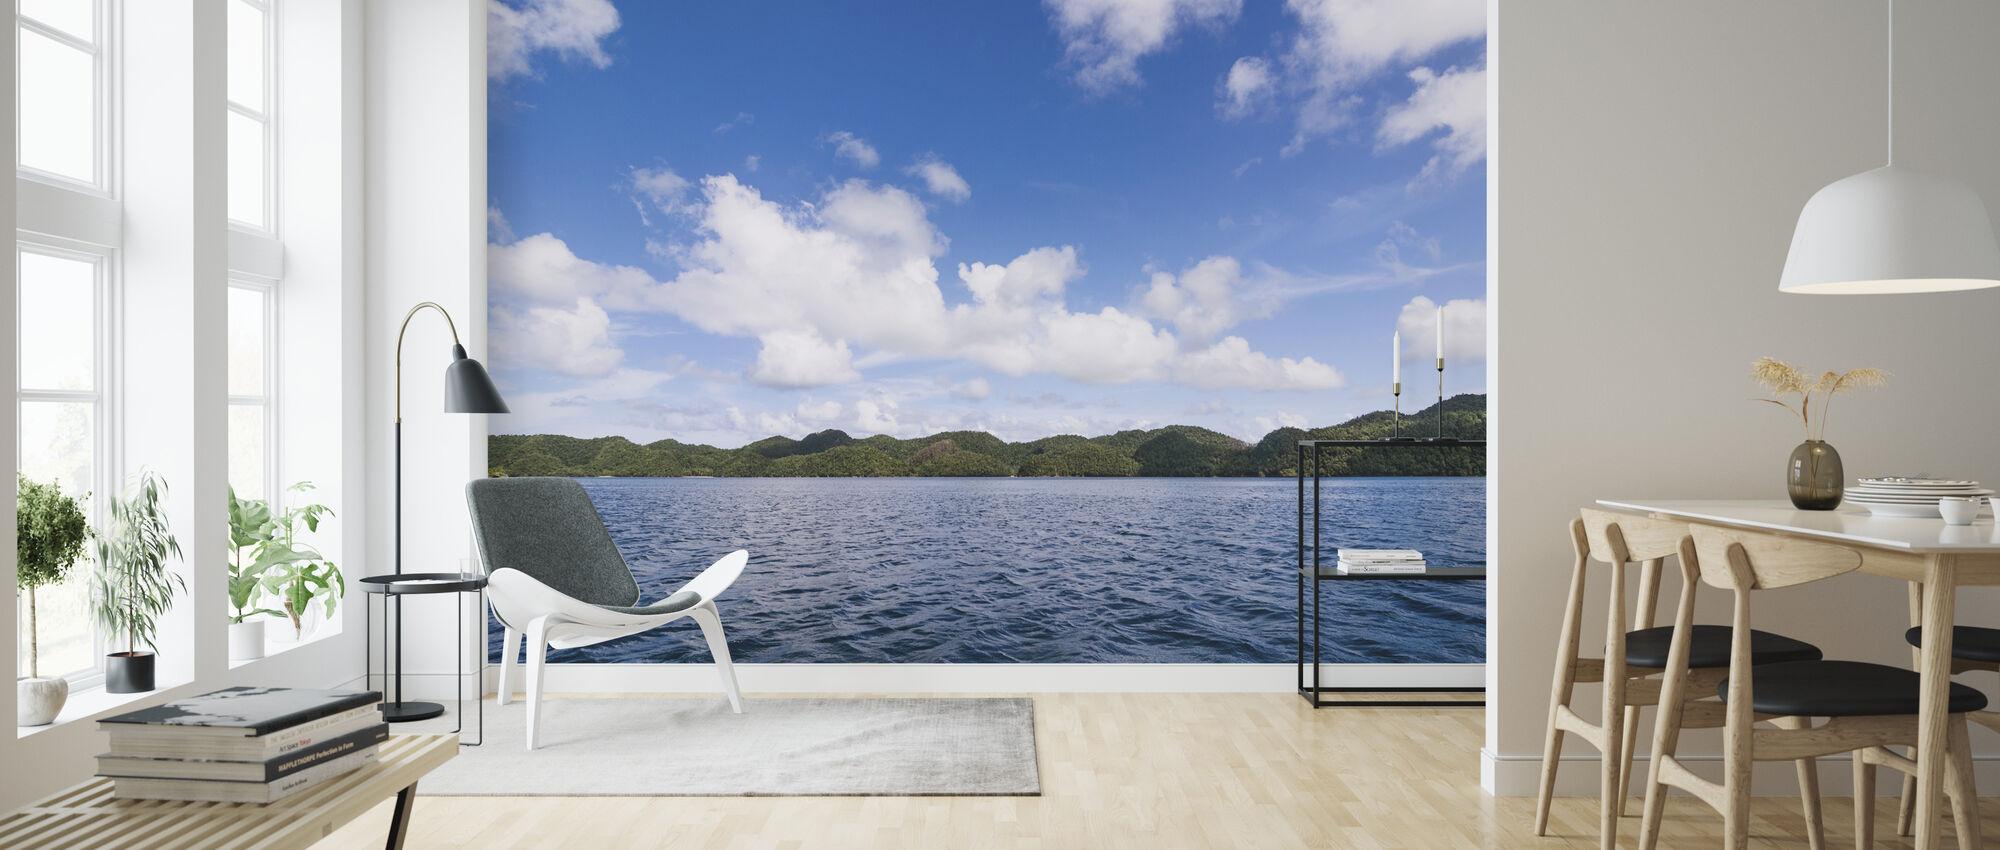 Bucas Grande Islets - Wallpaper - Living Room